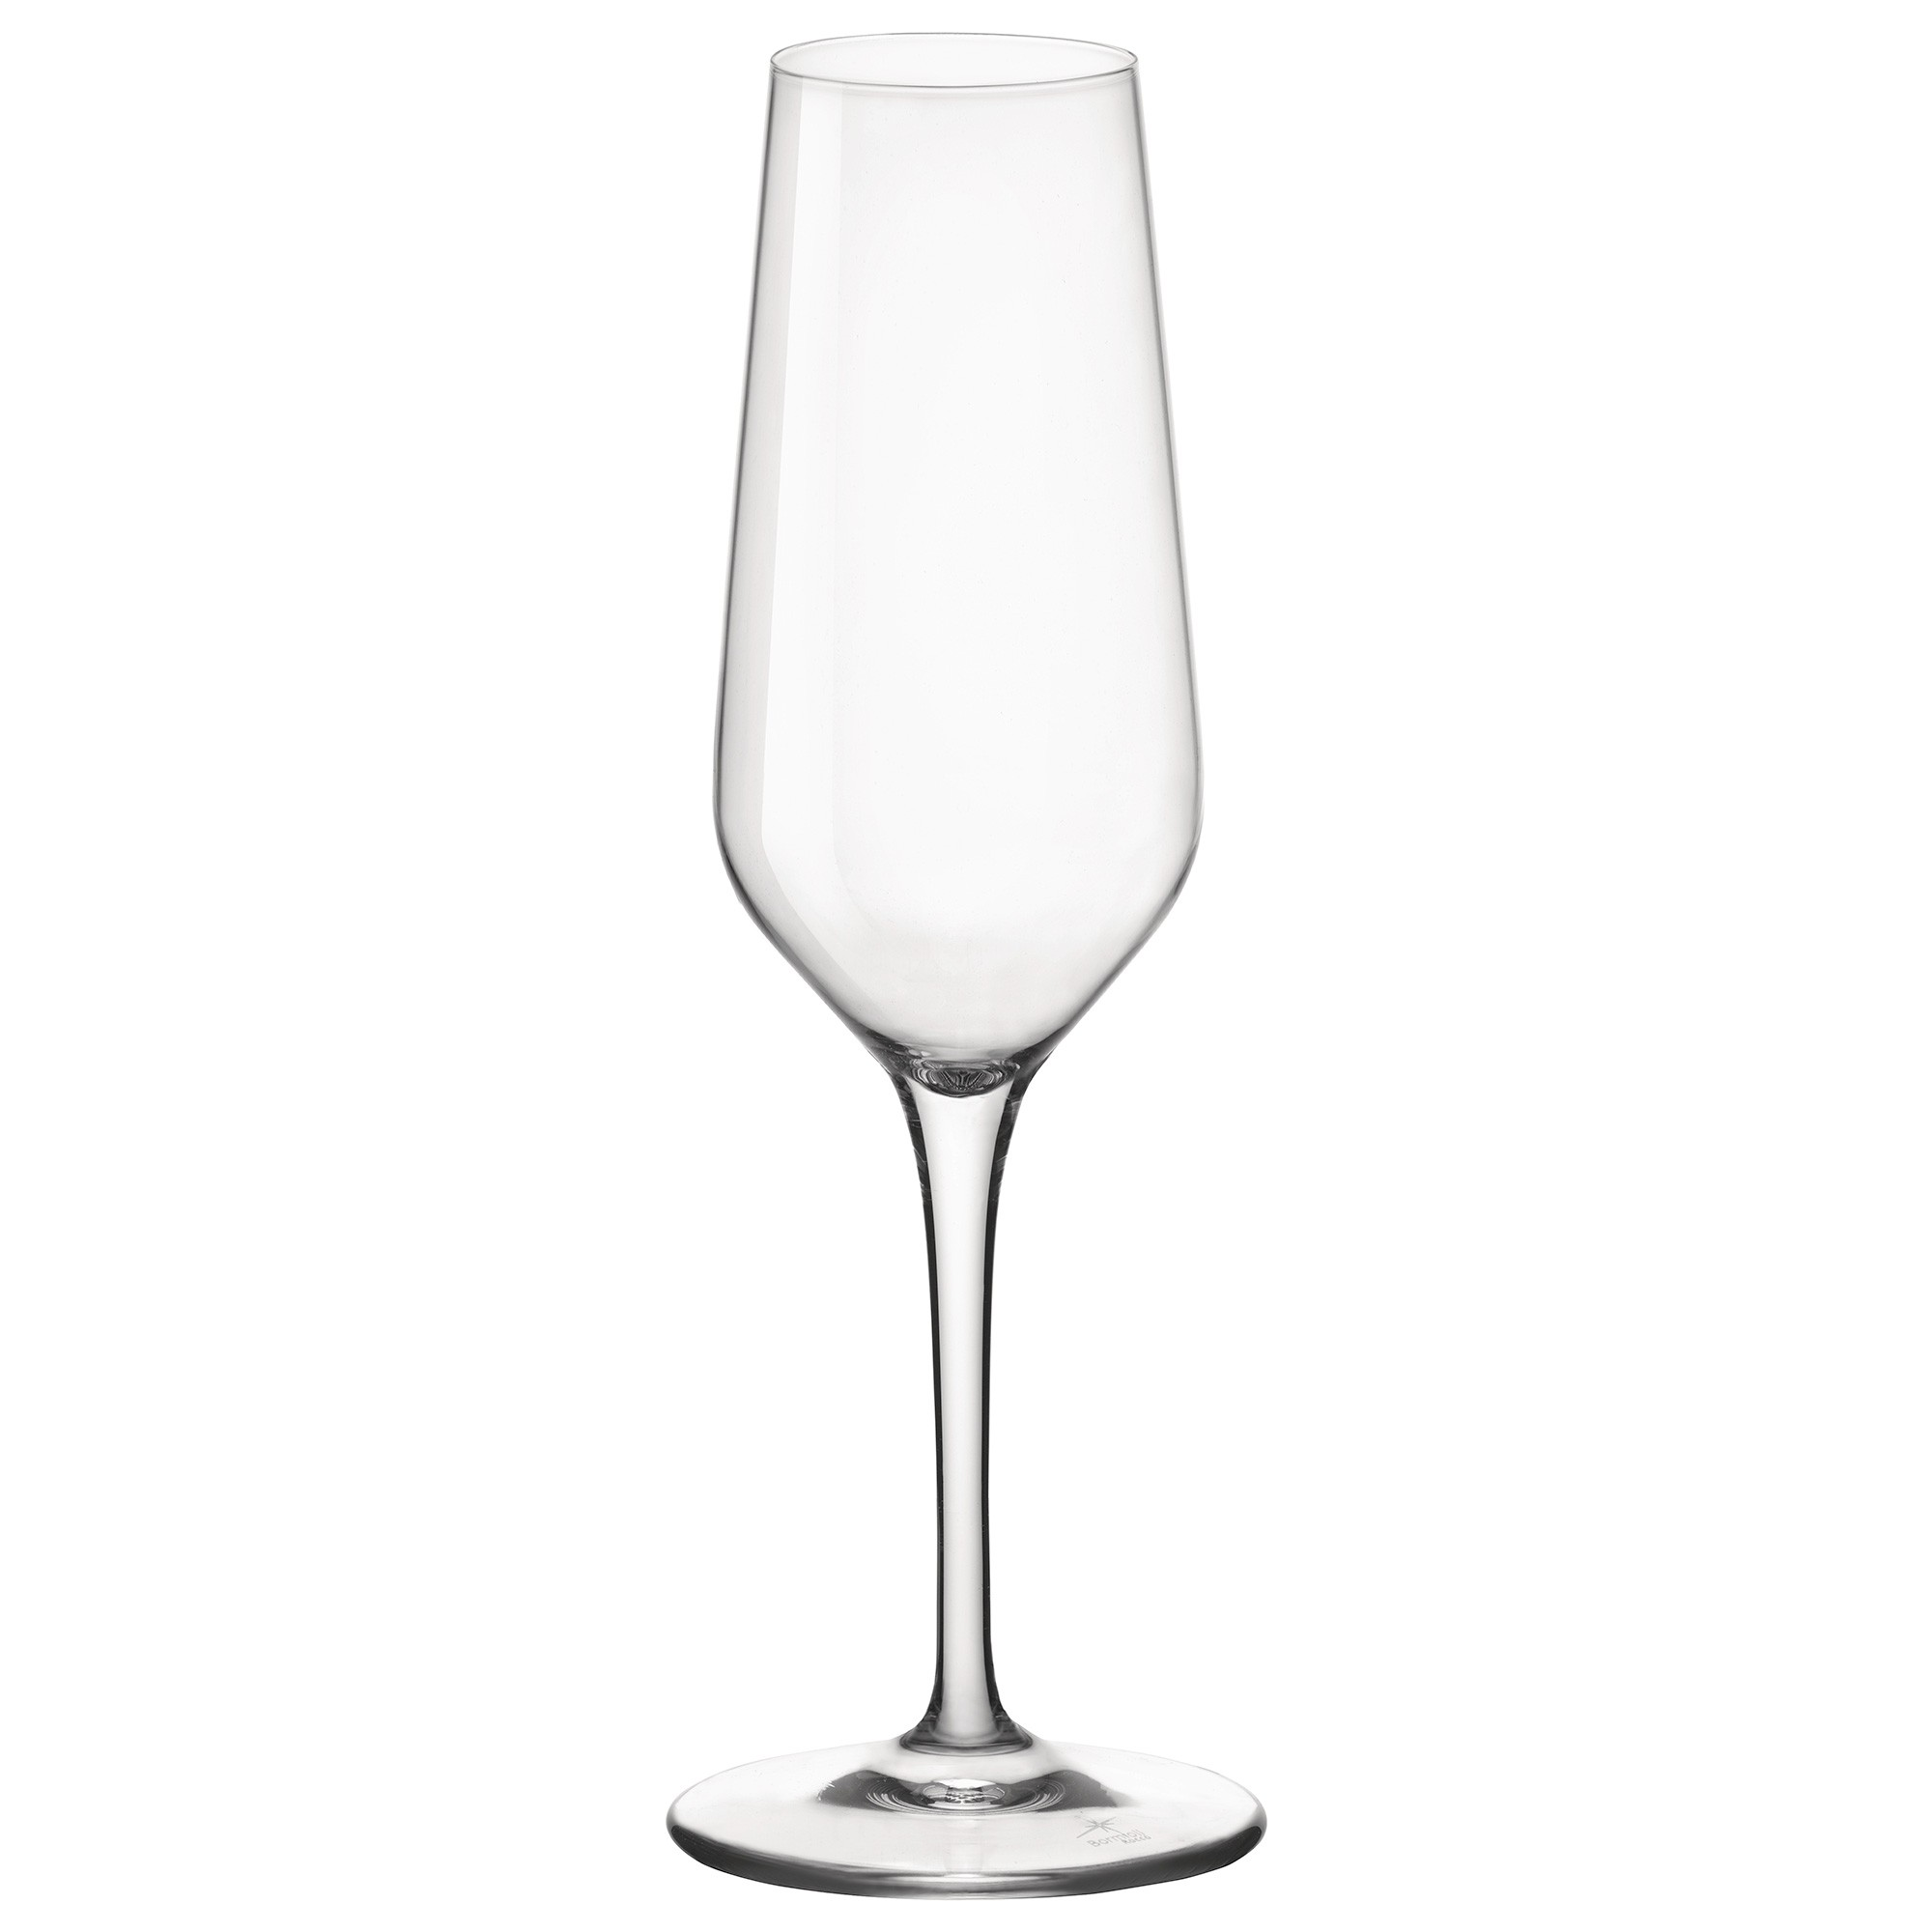 Bormioli Rocco Electra Champagne Flutes, Set of 6